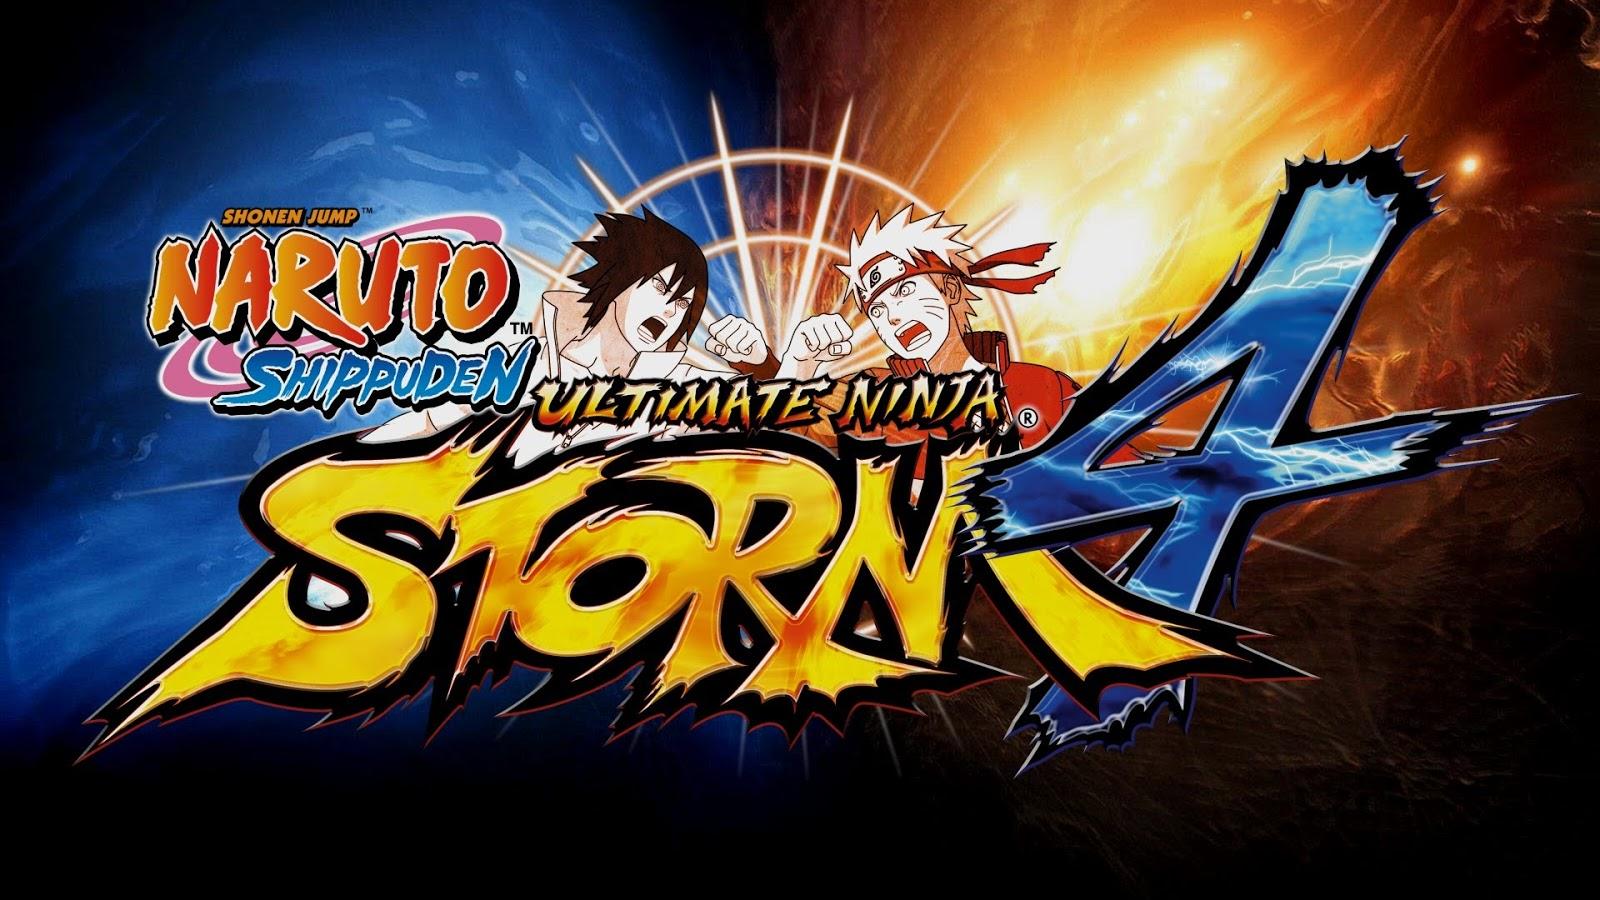 naruto-shippuden-ultimate-ninja-storm-4-viet-hoa